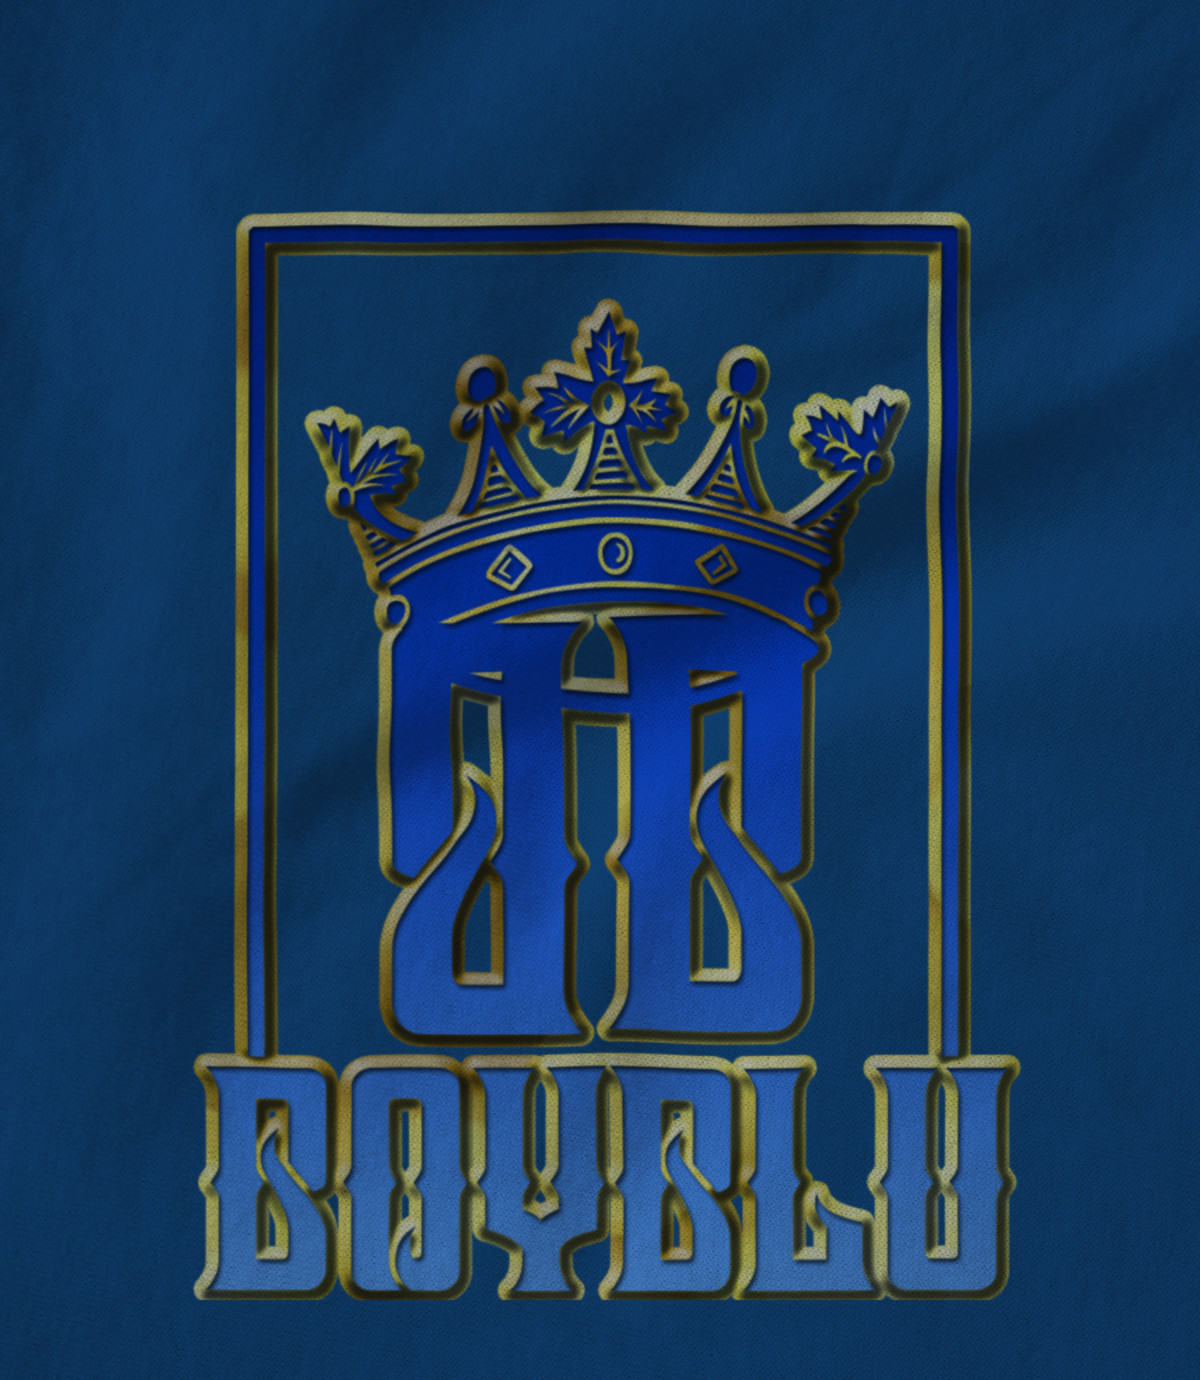 Boyblu boyblu 1531084975